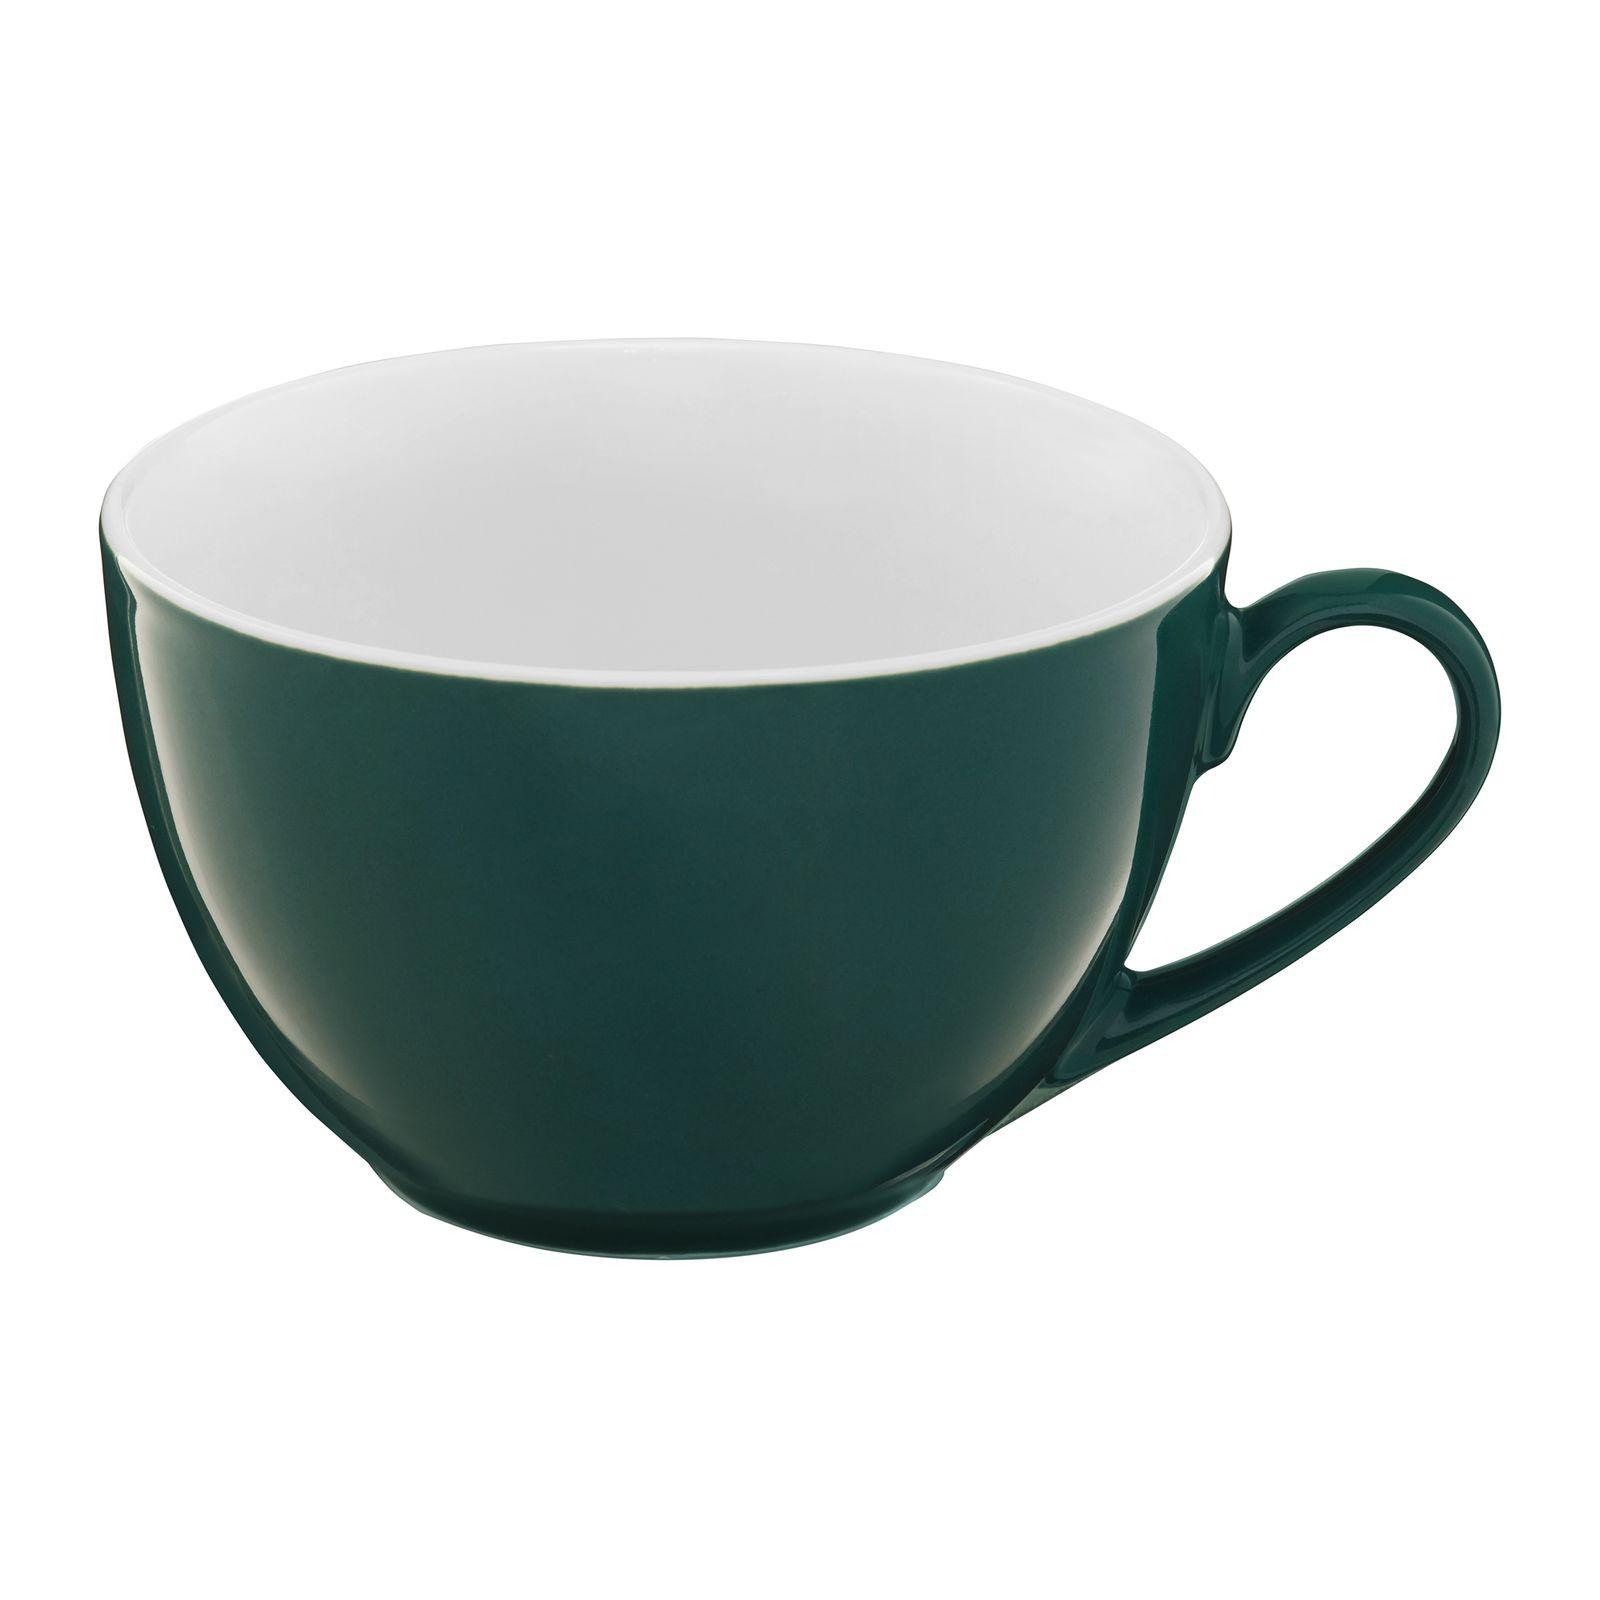 Komplet kawowy Aura Green 12-elementowy AMBITION